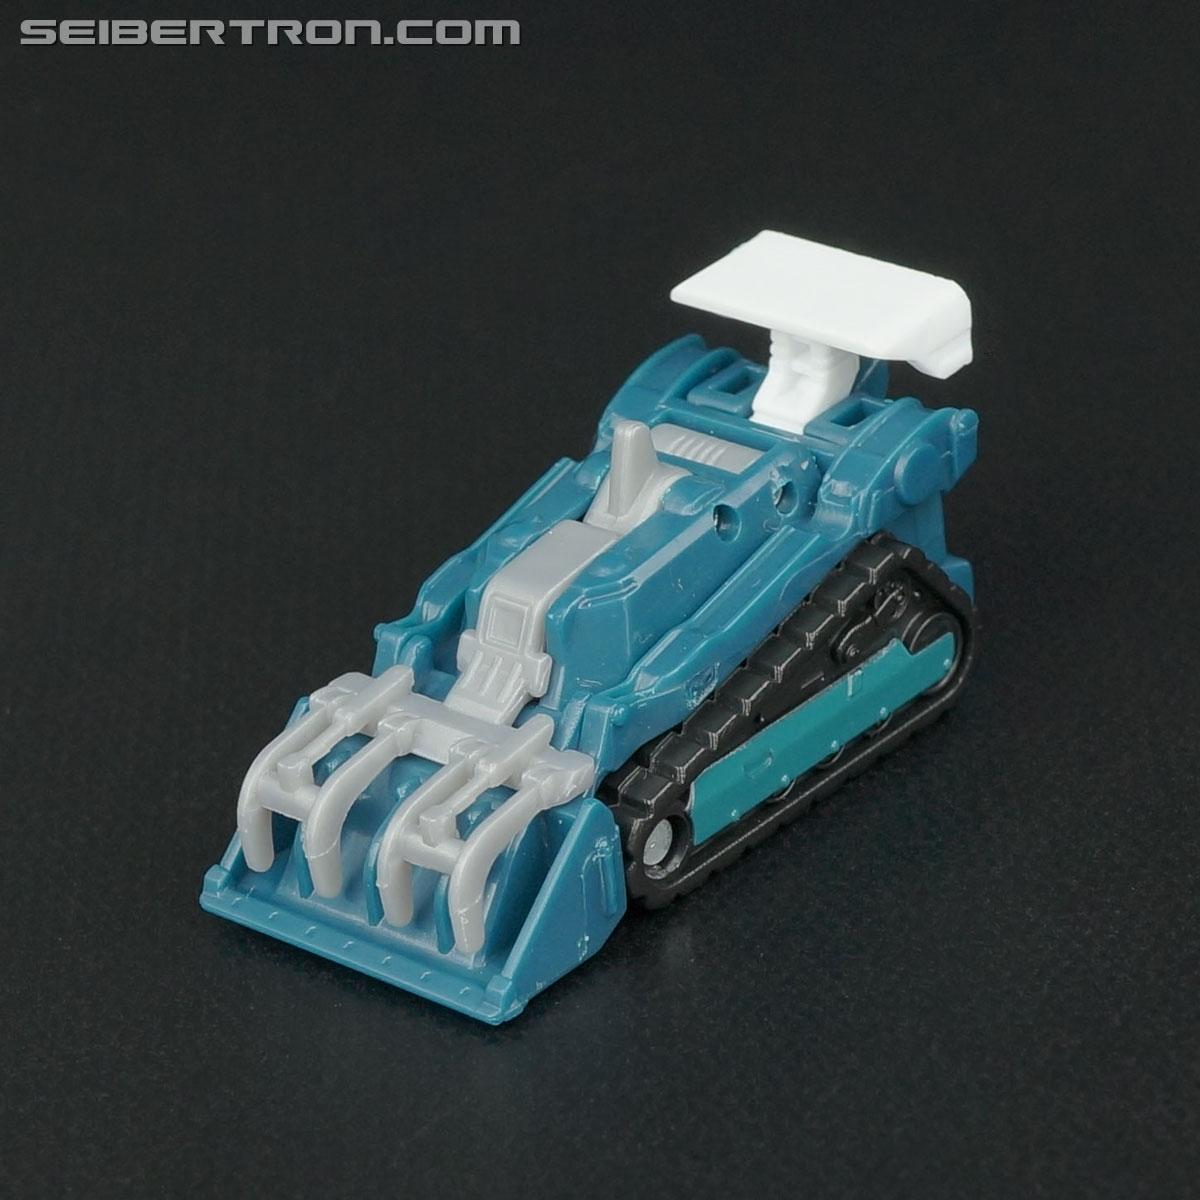 Transformers Legends Groundshaker (Image #12 of 66)